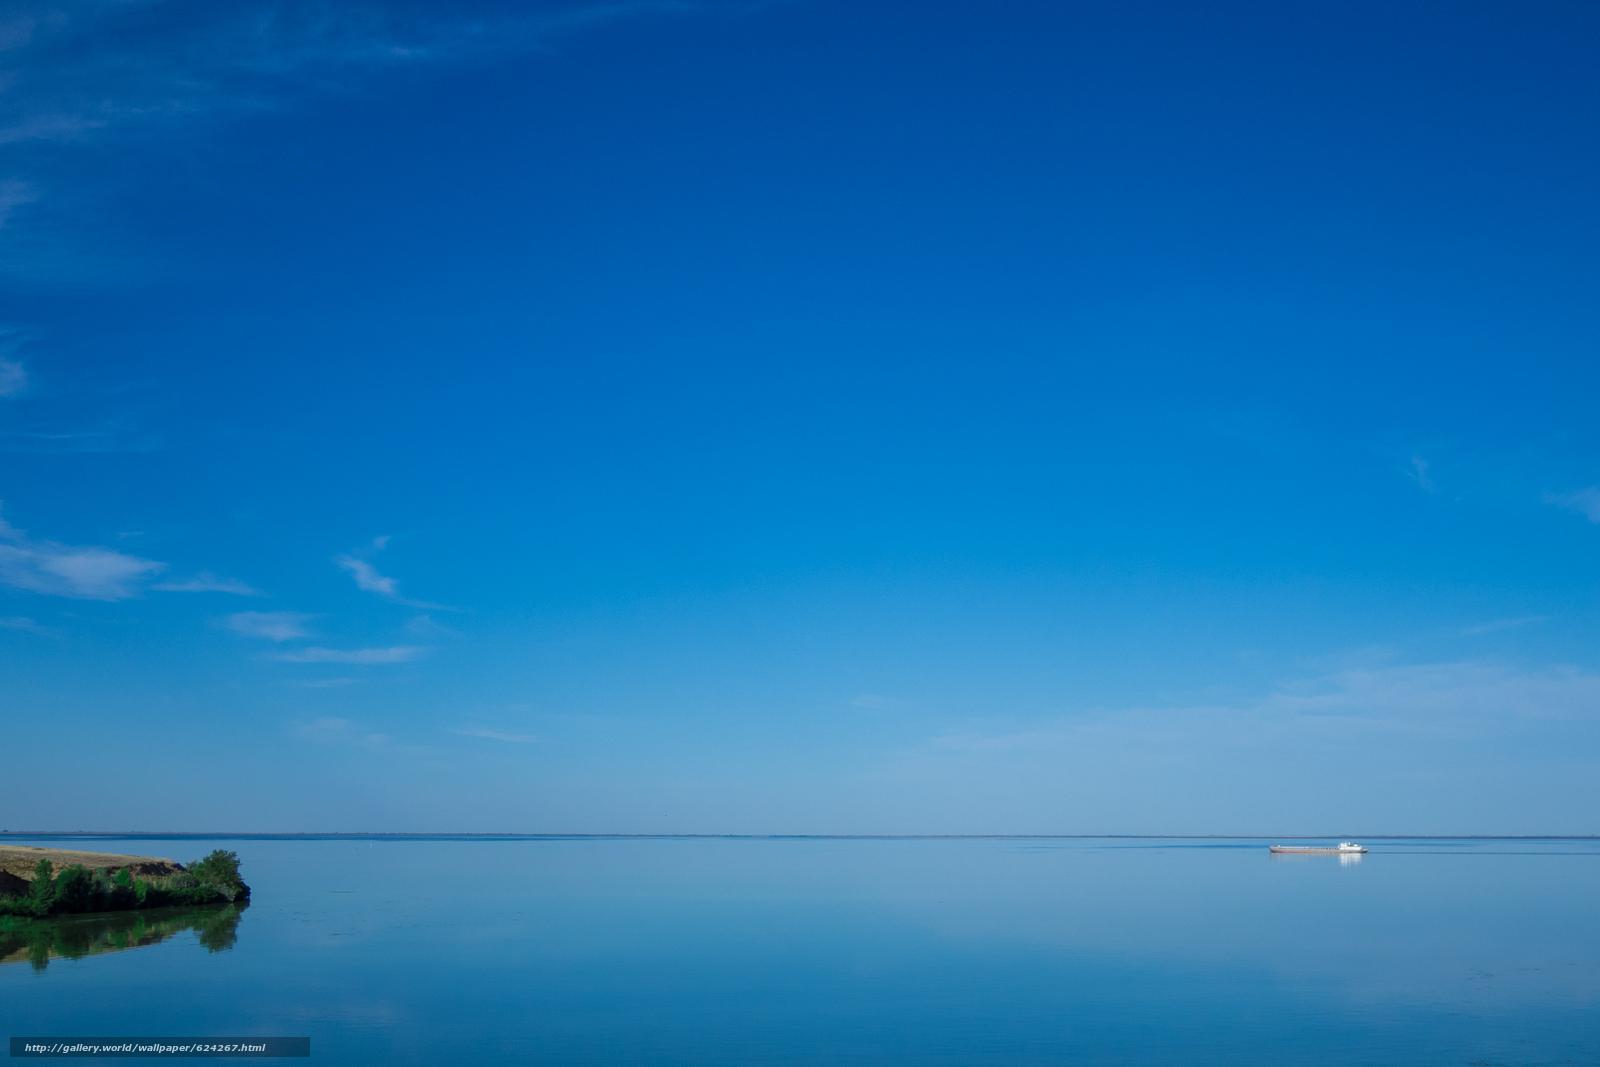 Download wallpaper Volgograd Sea,  Russia,  ship,  sky free desktop wallpaper in the resolution 3000x2000 — picture №624267